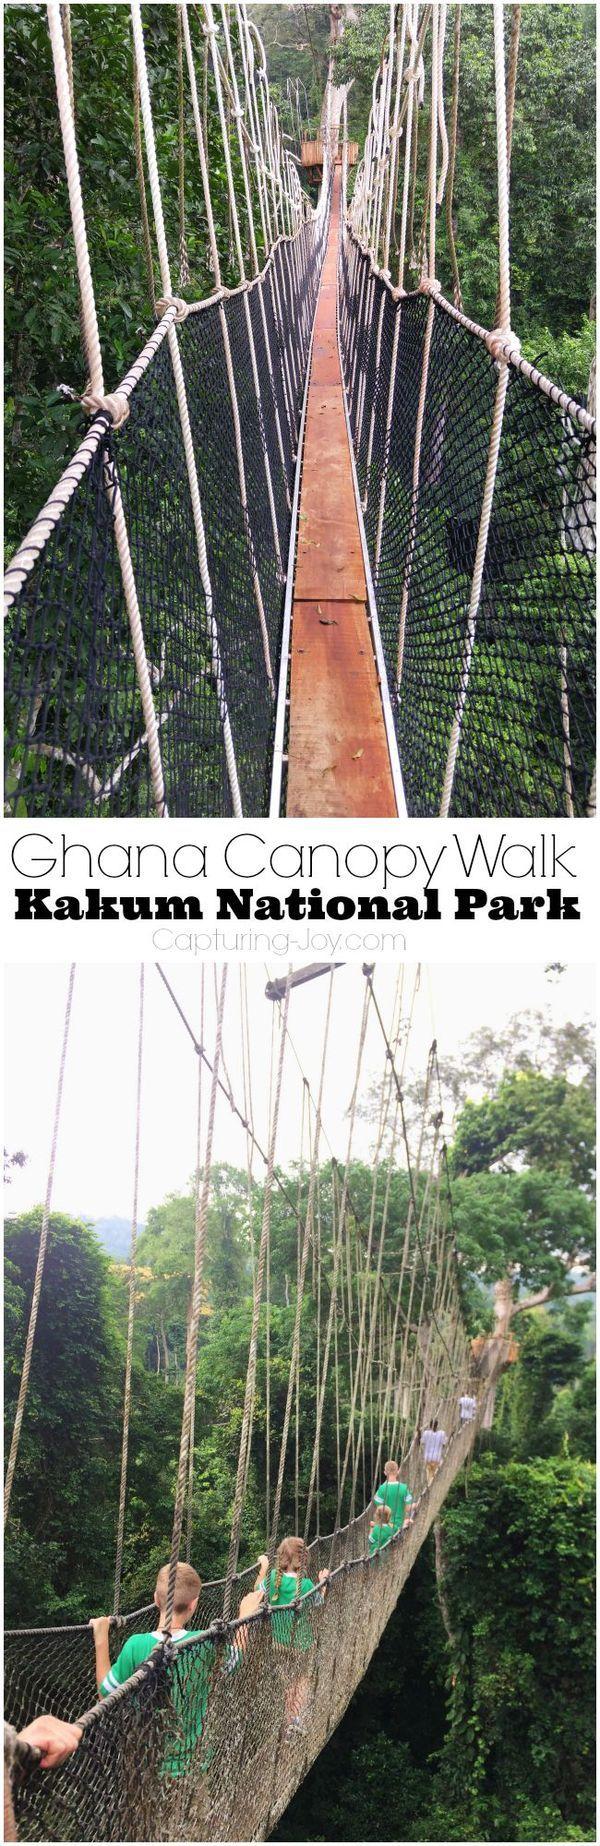 Ghana Canopy Walk Kakum National Park!  Traveling tips for visiting Ghana with your family.